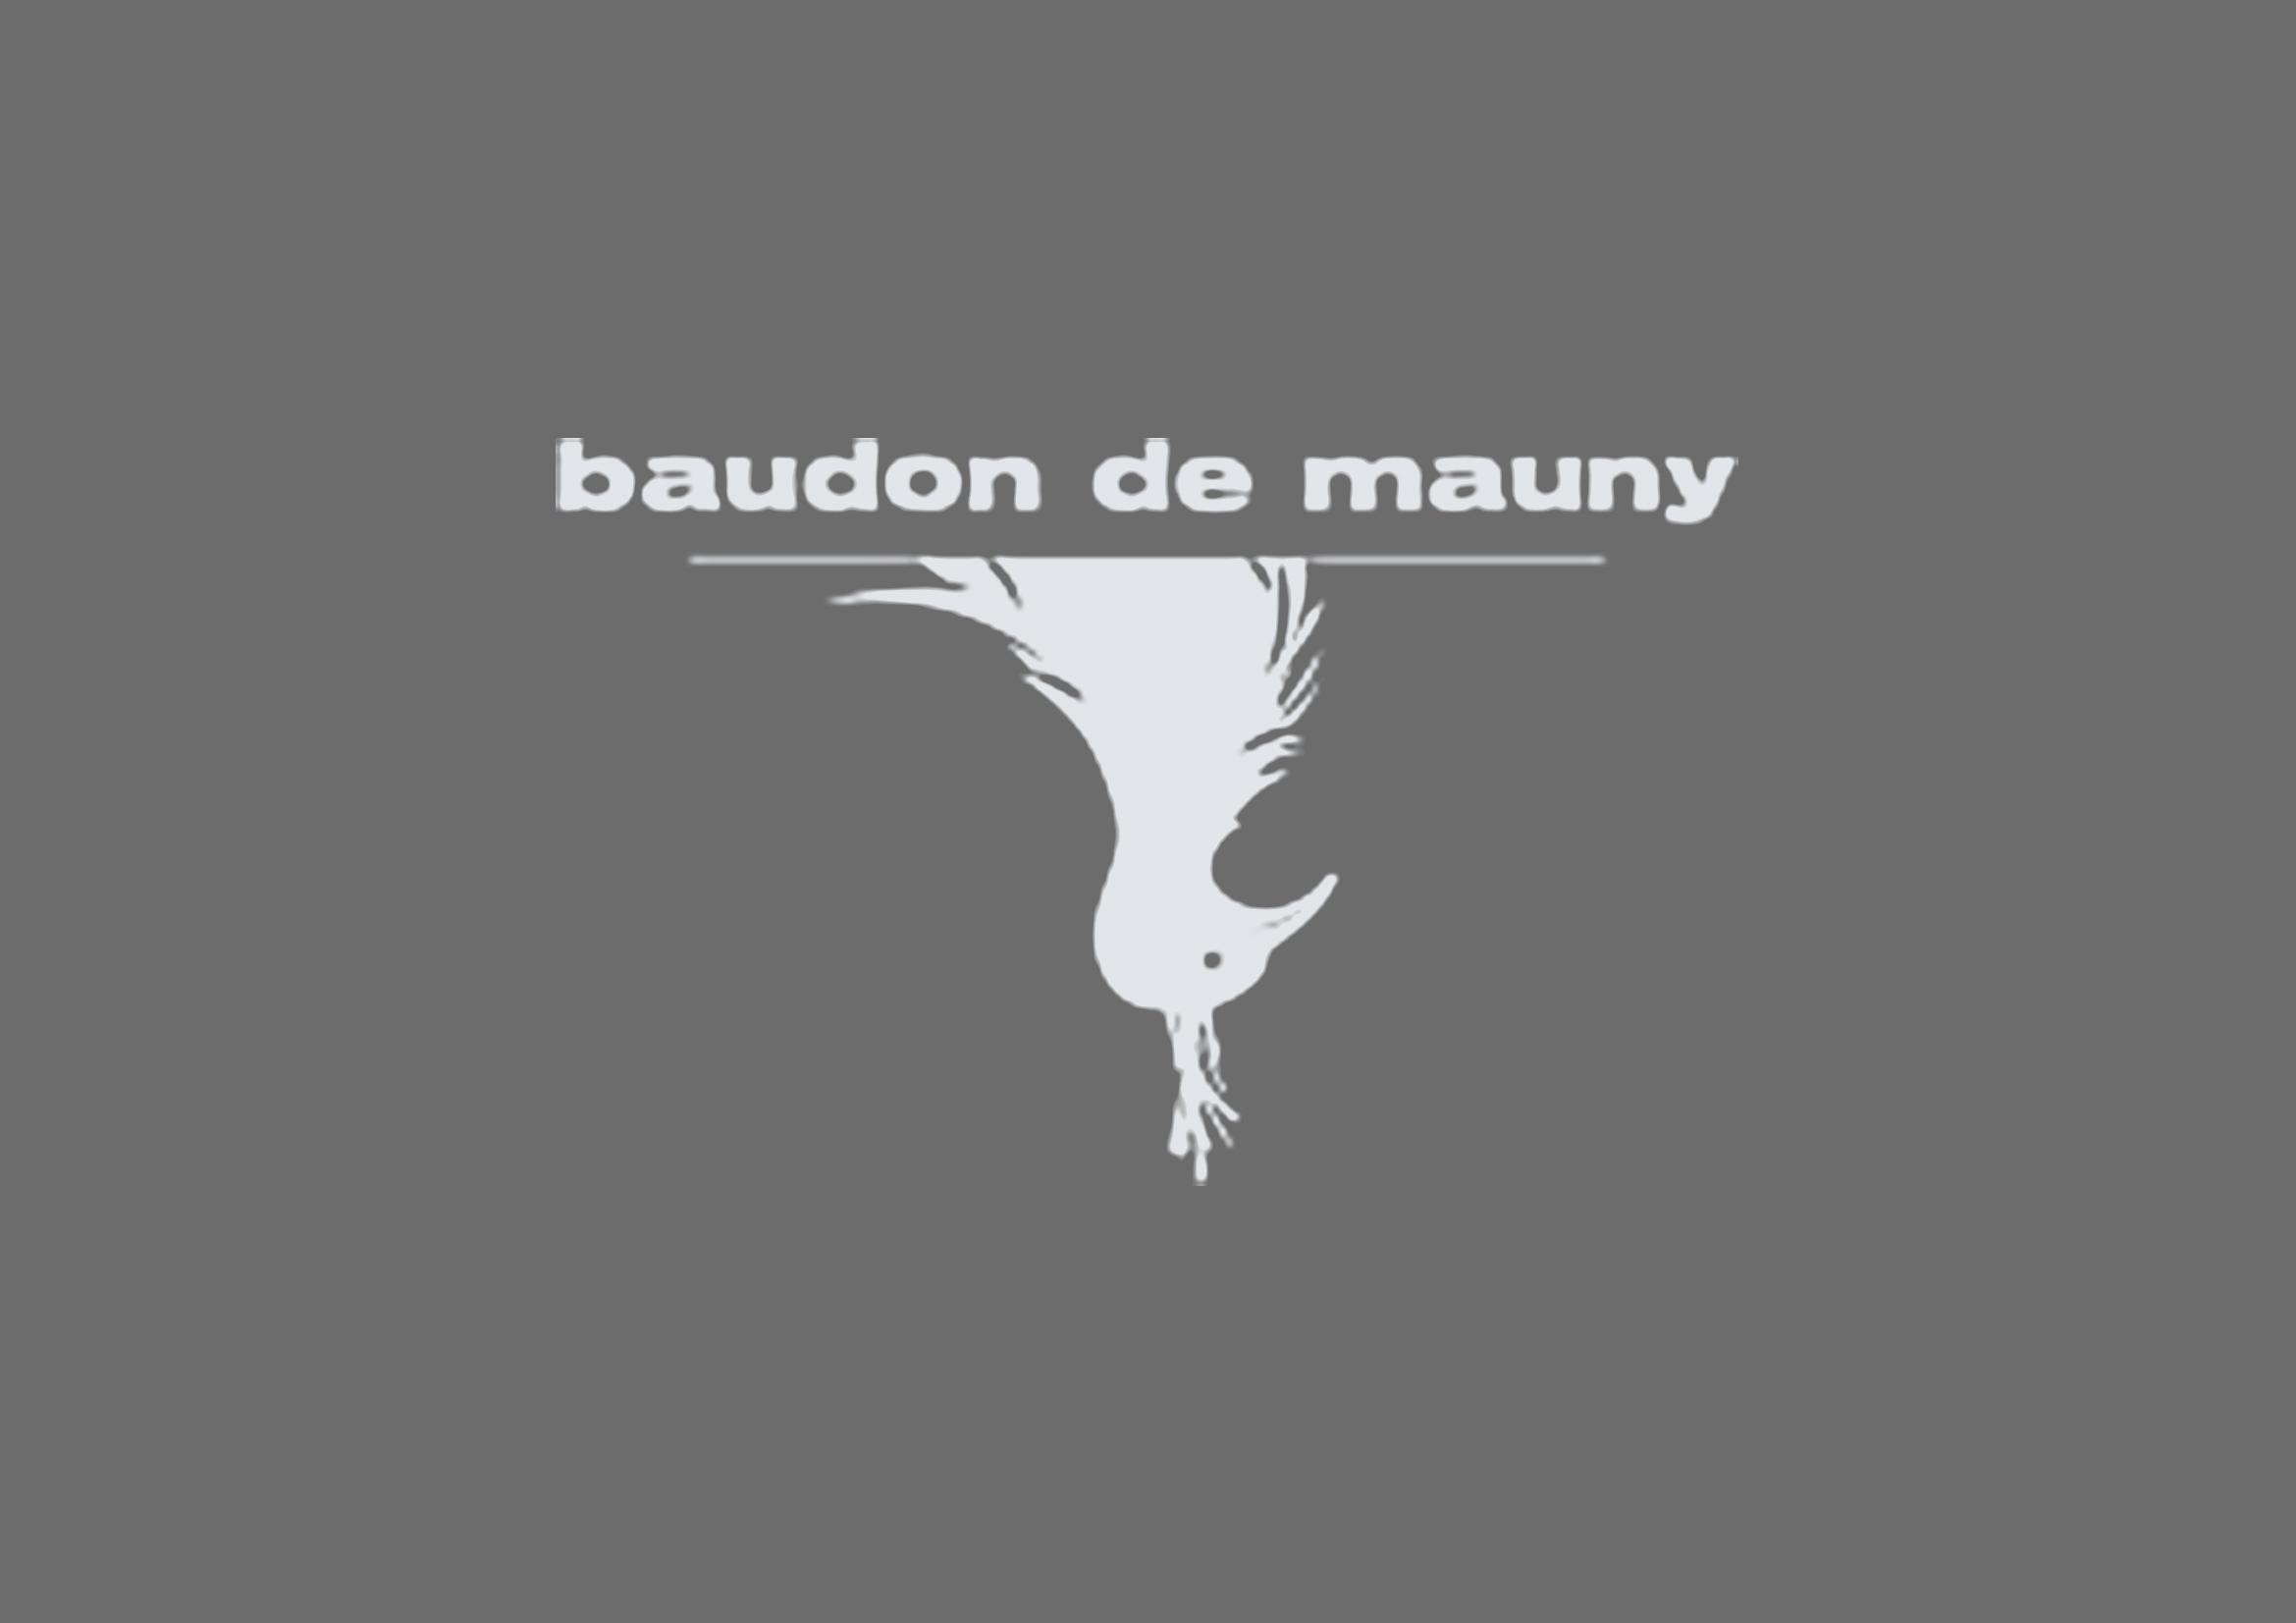 L'Hôtel Baudon de Mauny